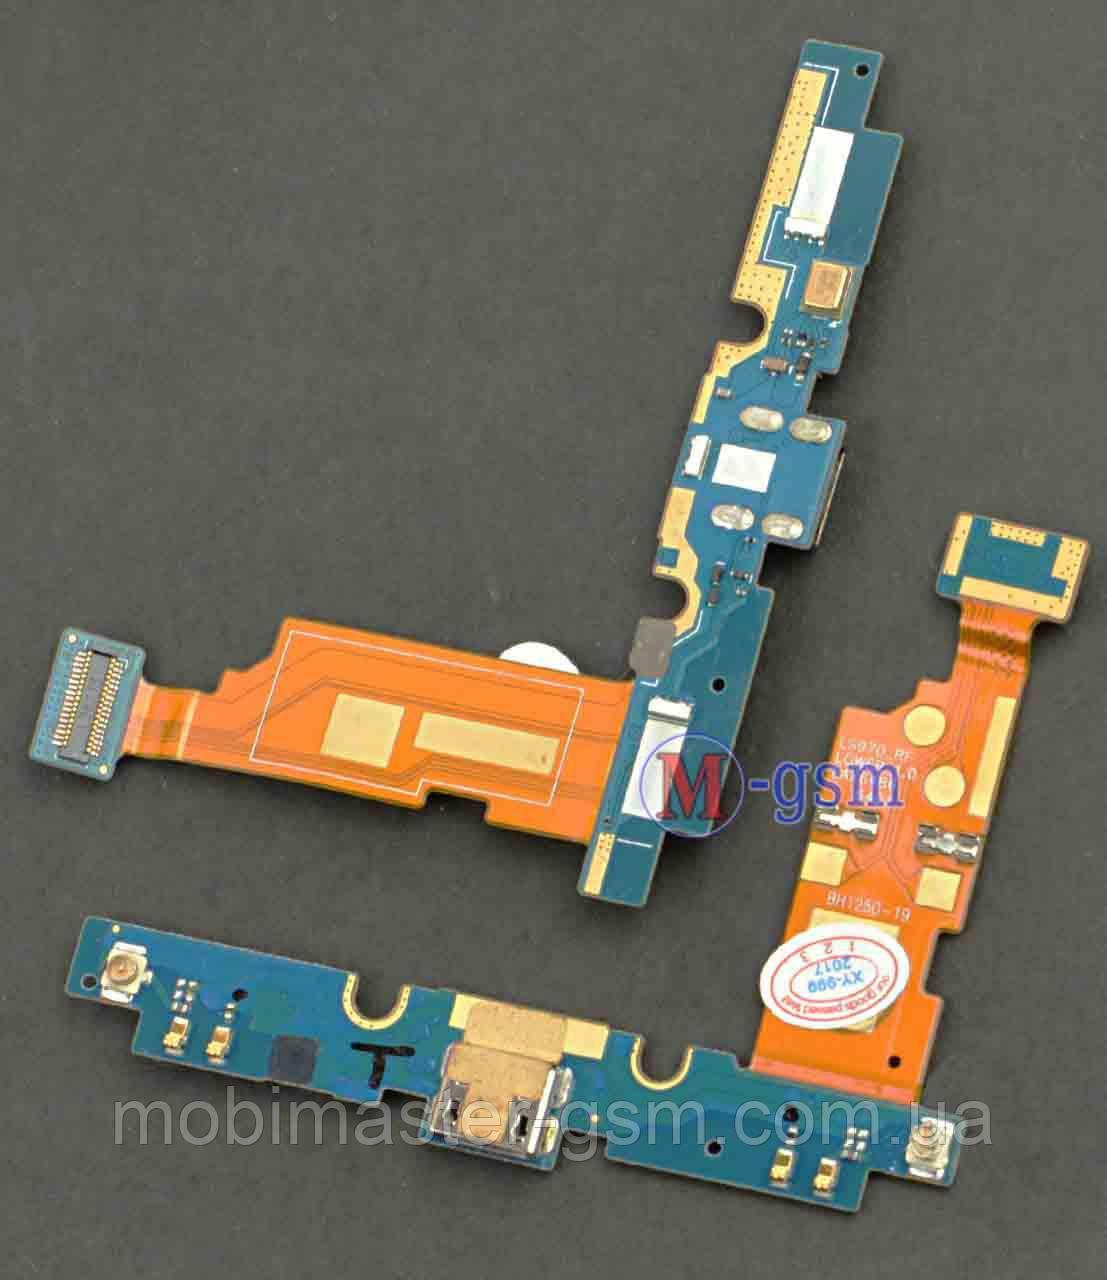 Шлейф LG E975 Optimus G с коннектором зарядки и компонентами